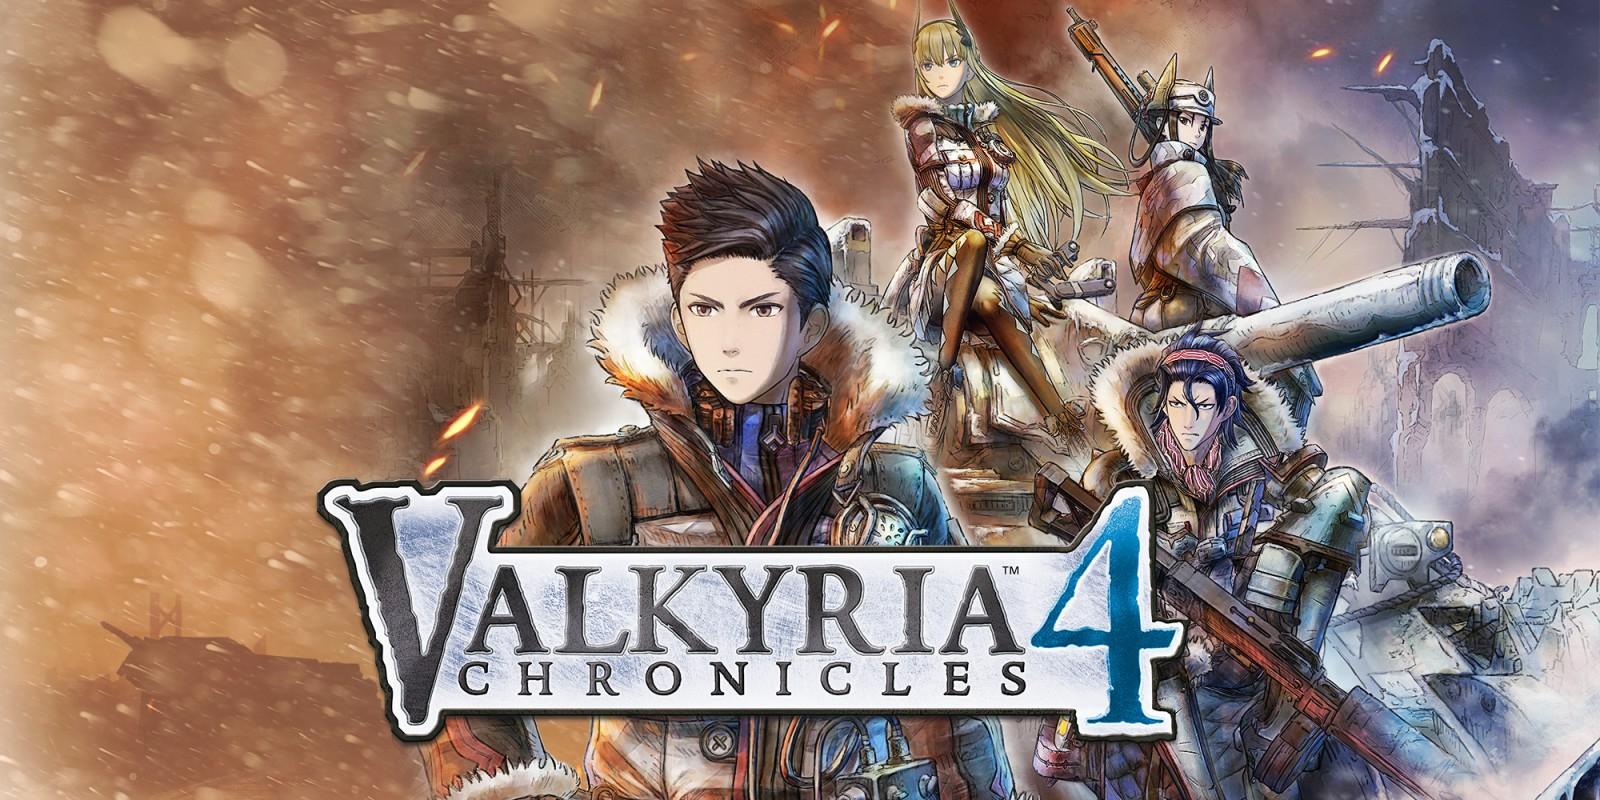 Valkyria Chronicles 4 (Nintendo Switch) - £12.24 @ Nintendo eShop